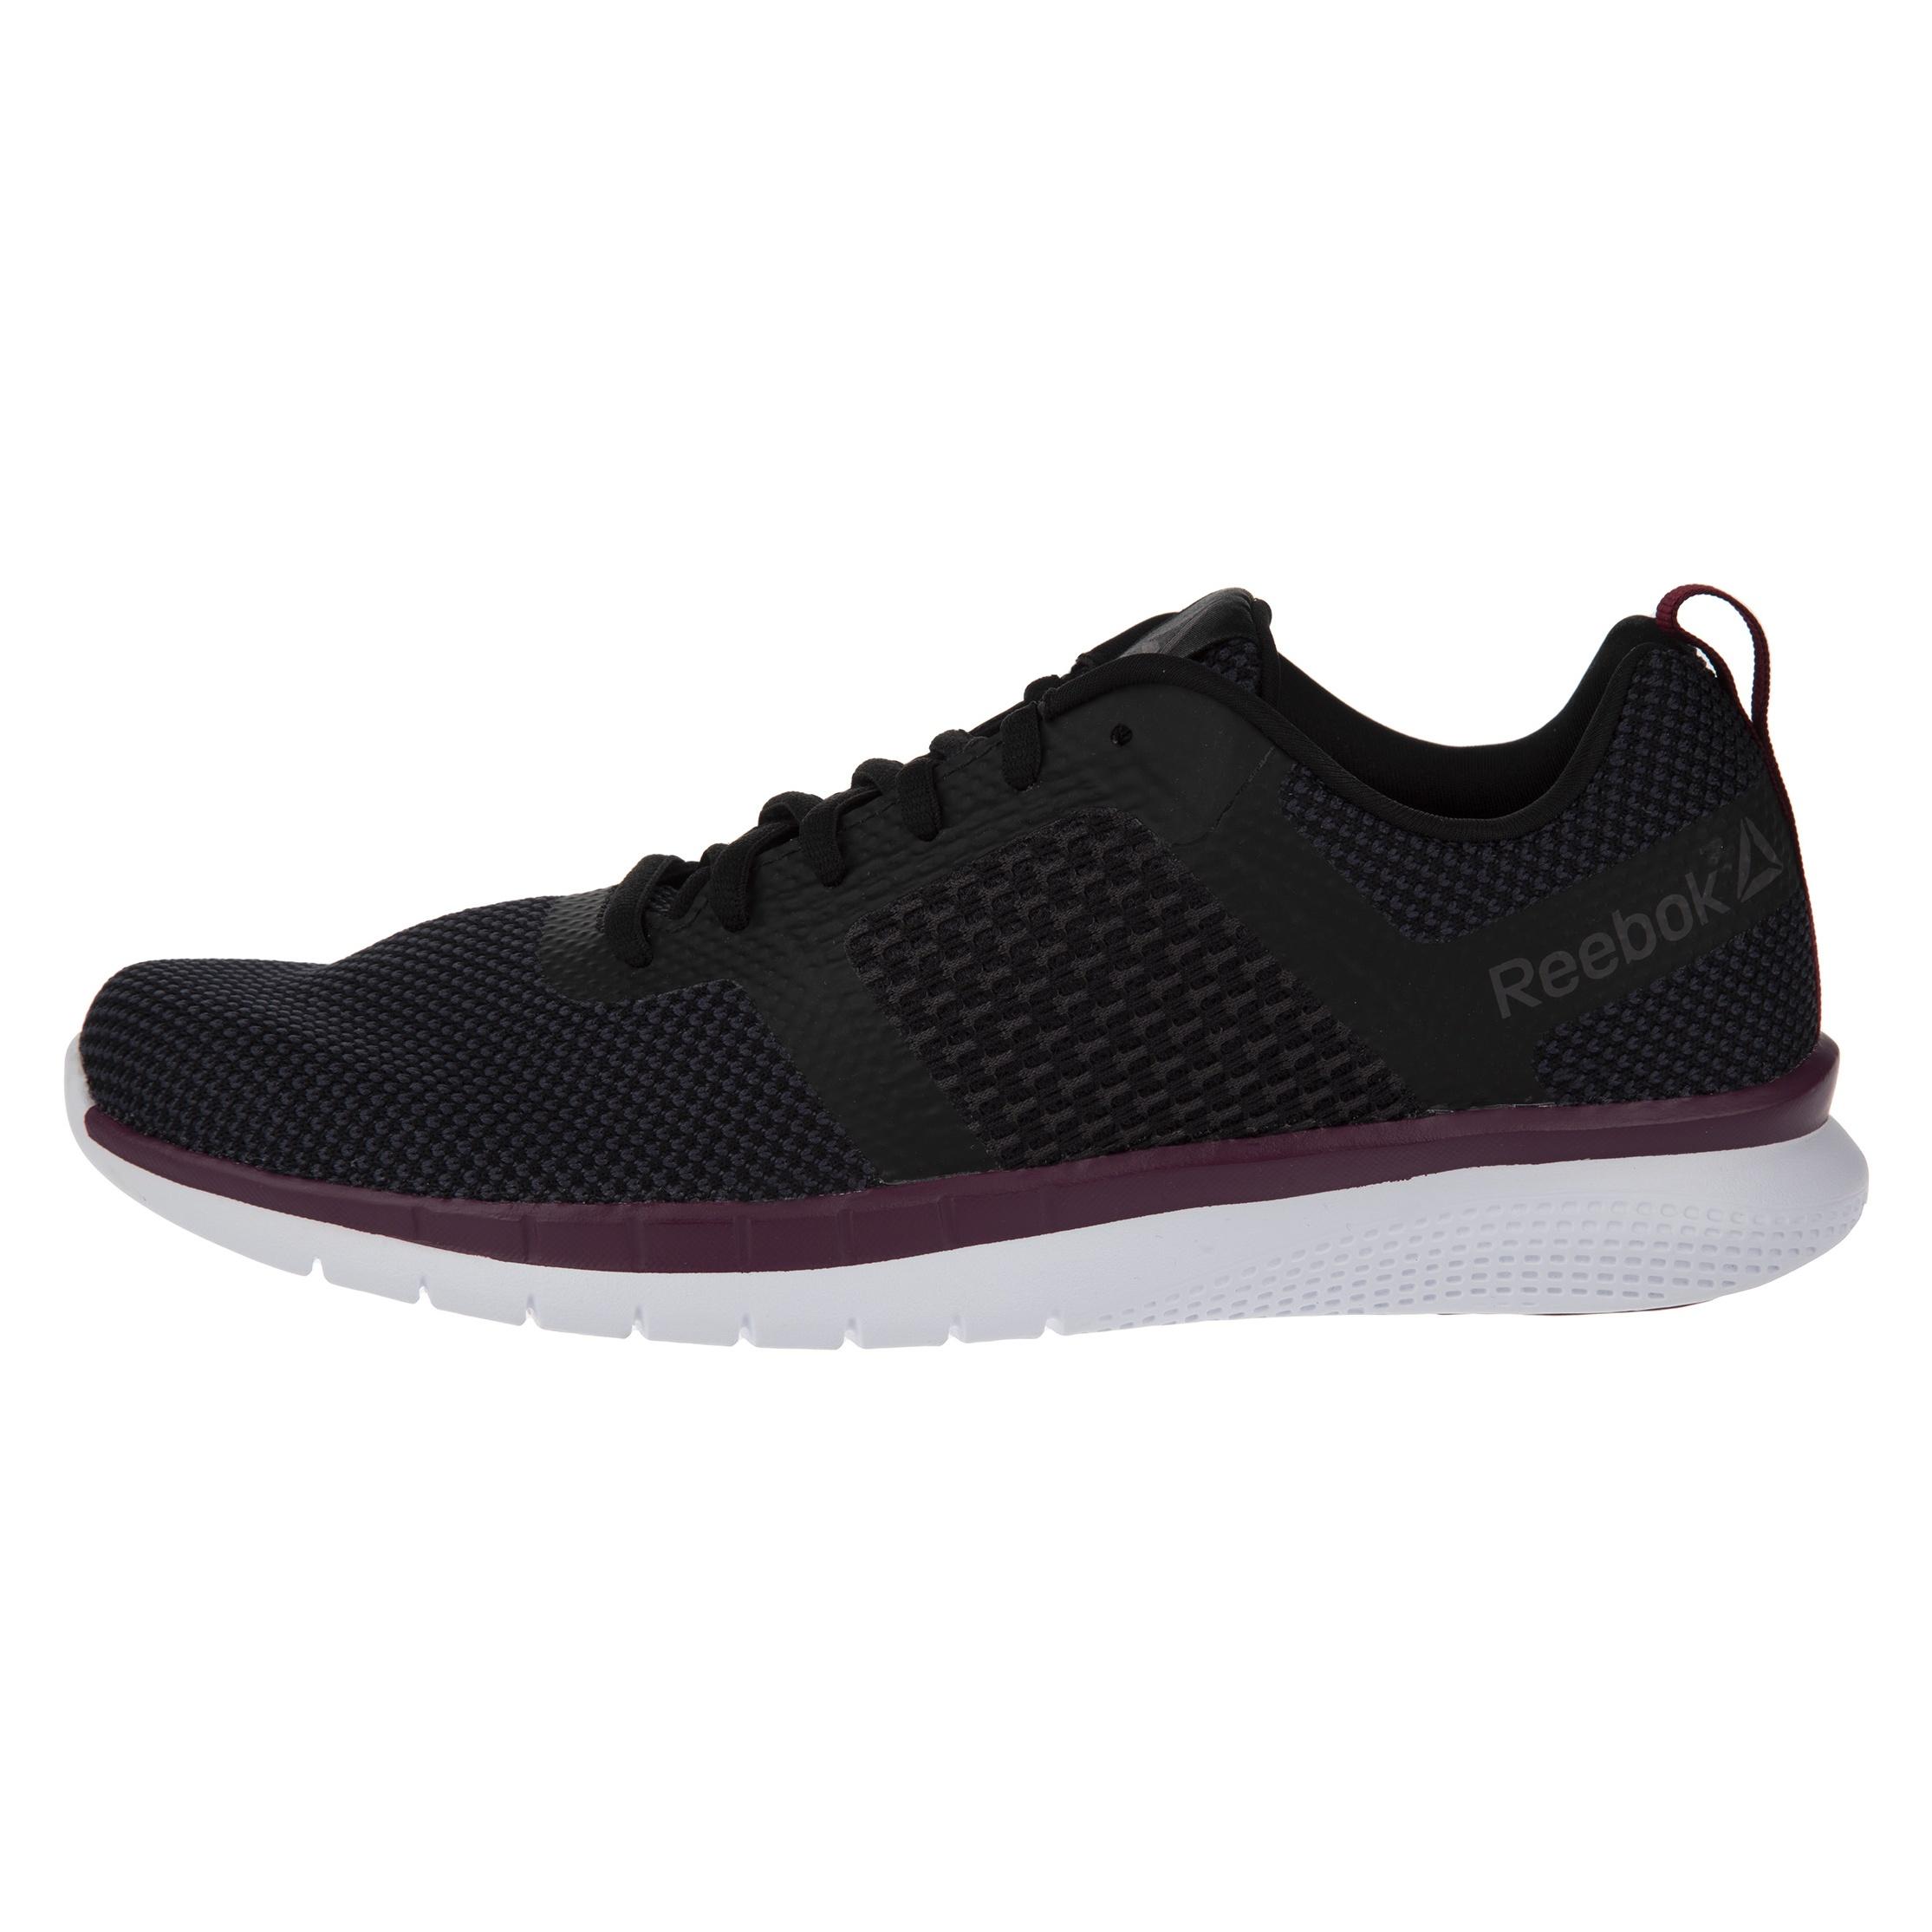 کفش دویدن مردانه ریباک مدل PT PRIME RUNNER FC-CN5676